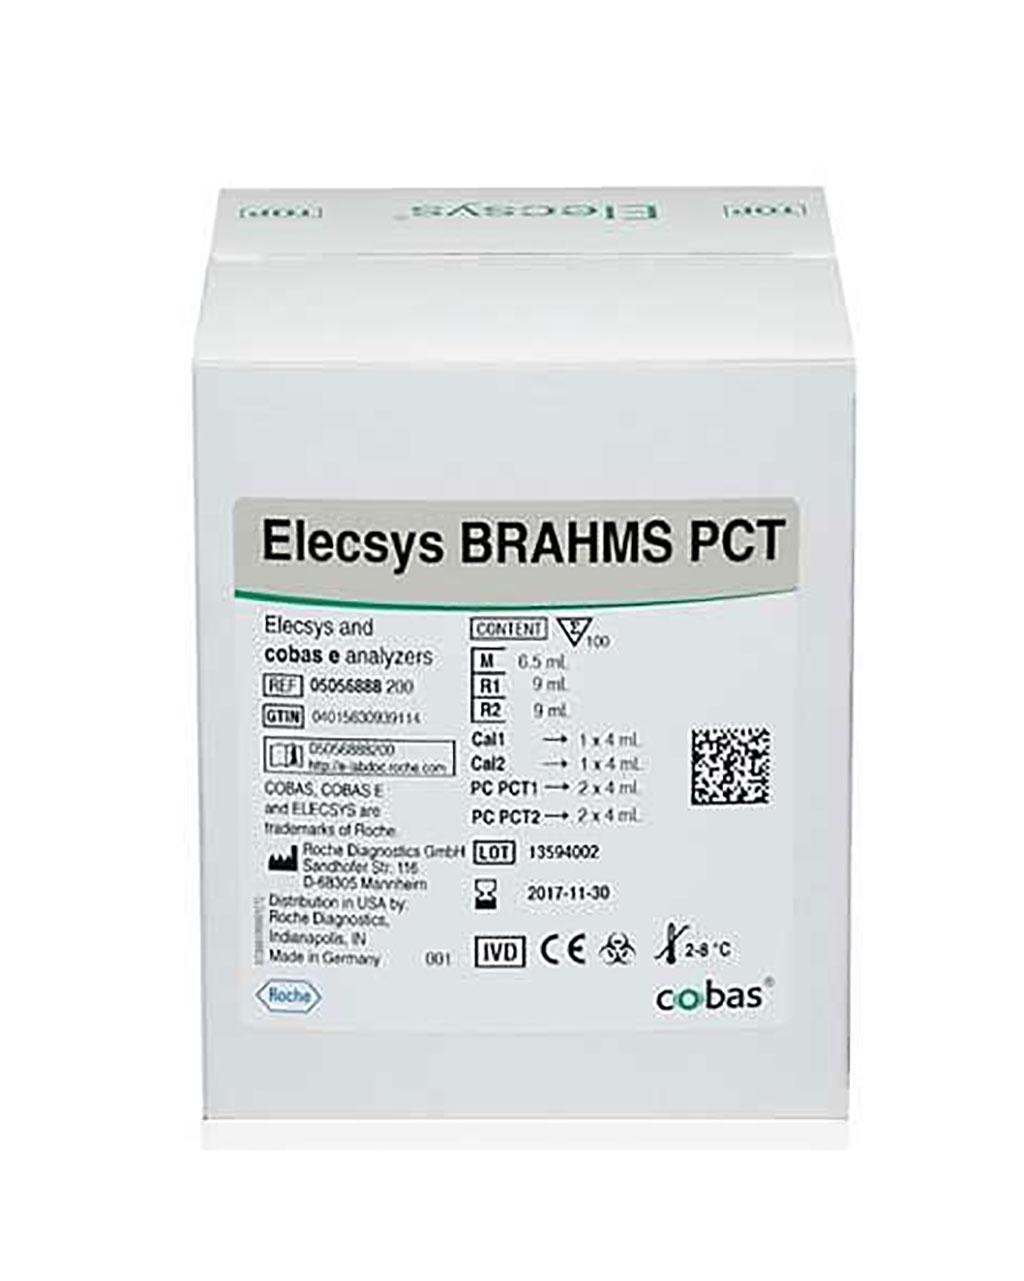 Image: Elecsys BRAHMS PCT Assay measures procalcitonin in human serum (Photo courtesy of Roche Diagnostics).